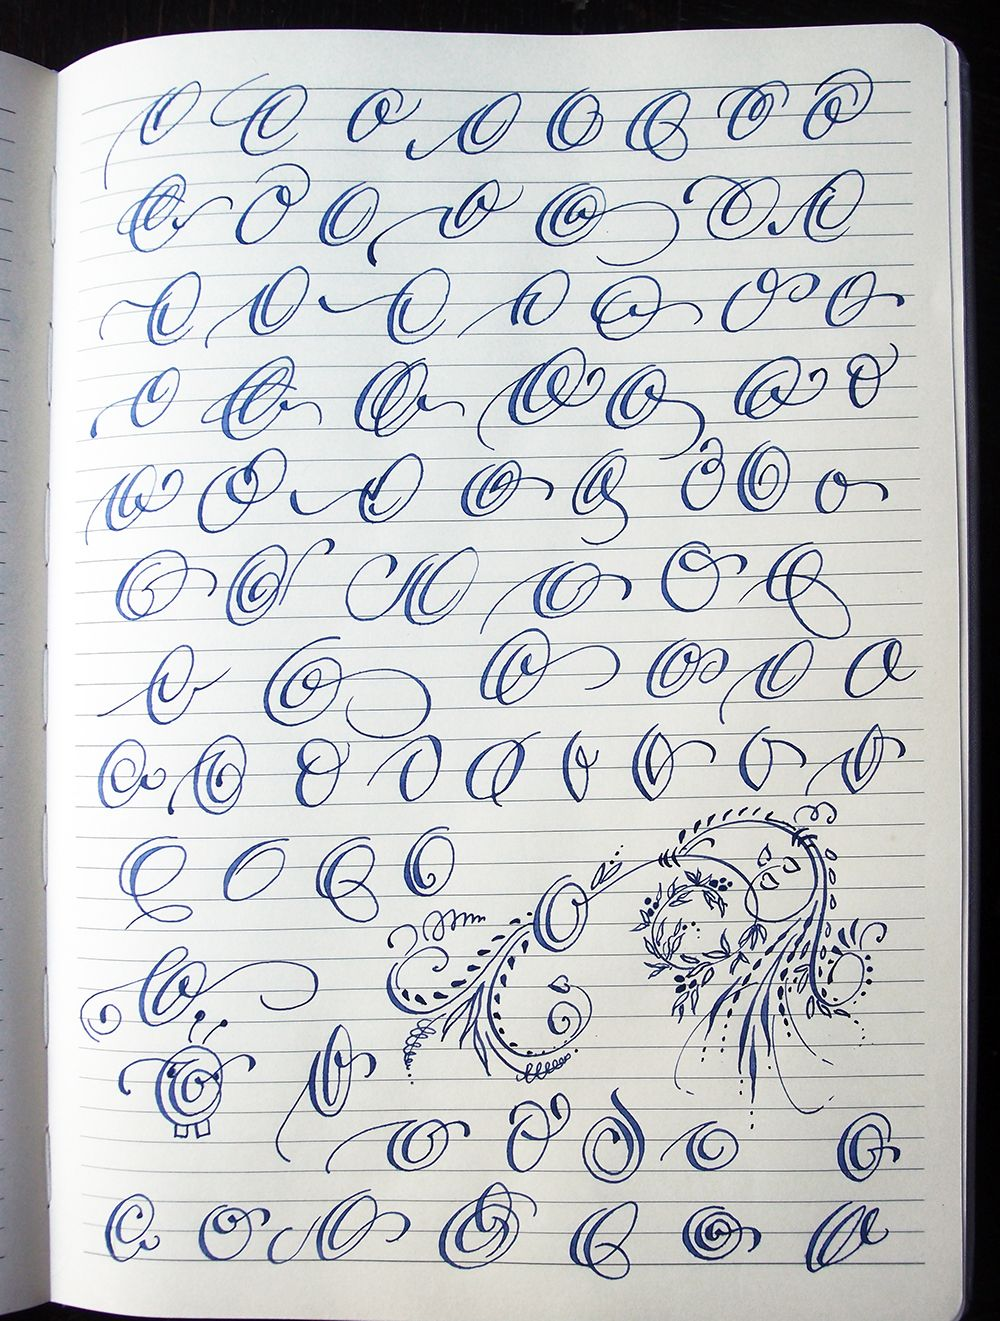 My capital letters | kalligrafie | Pinterest | Caligrafía, Letras y ...